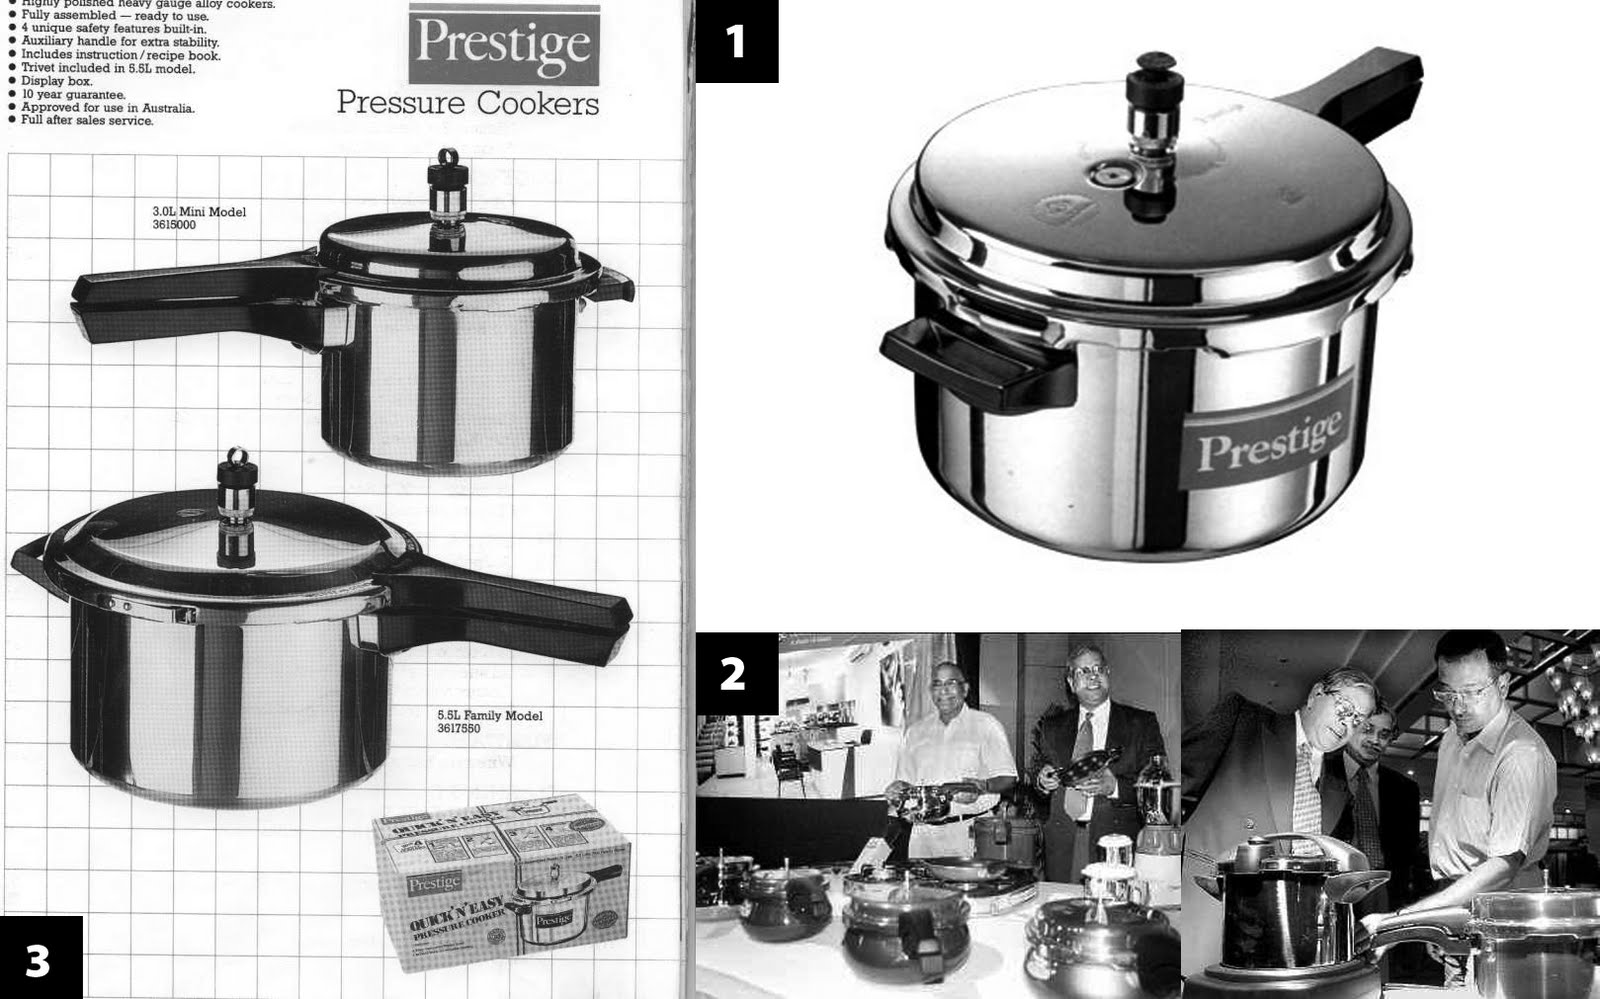 My Pressure Cooker Fascination